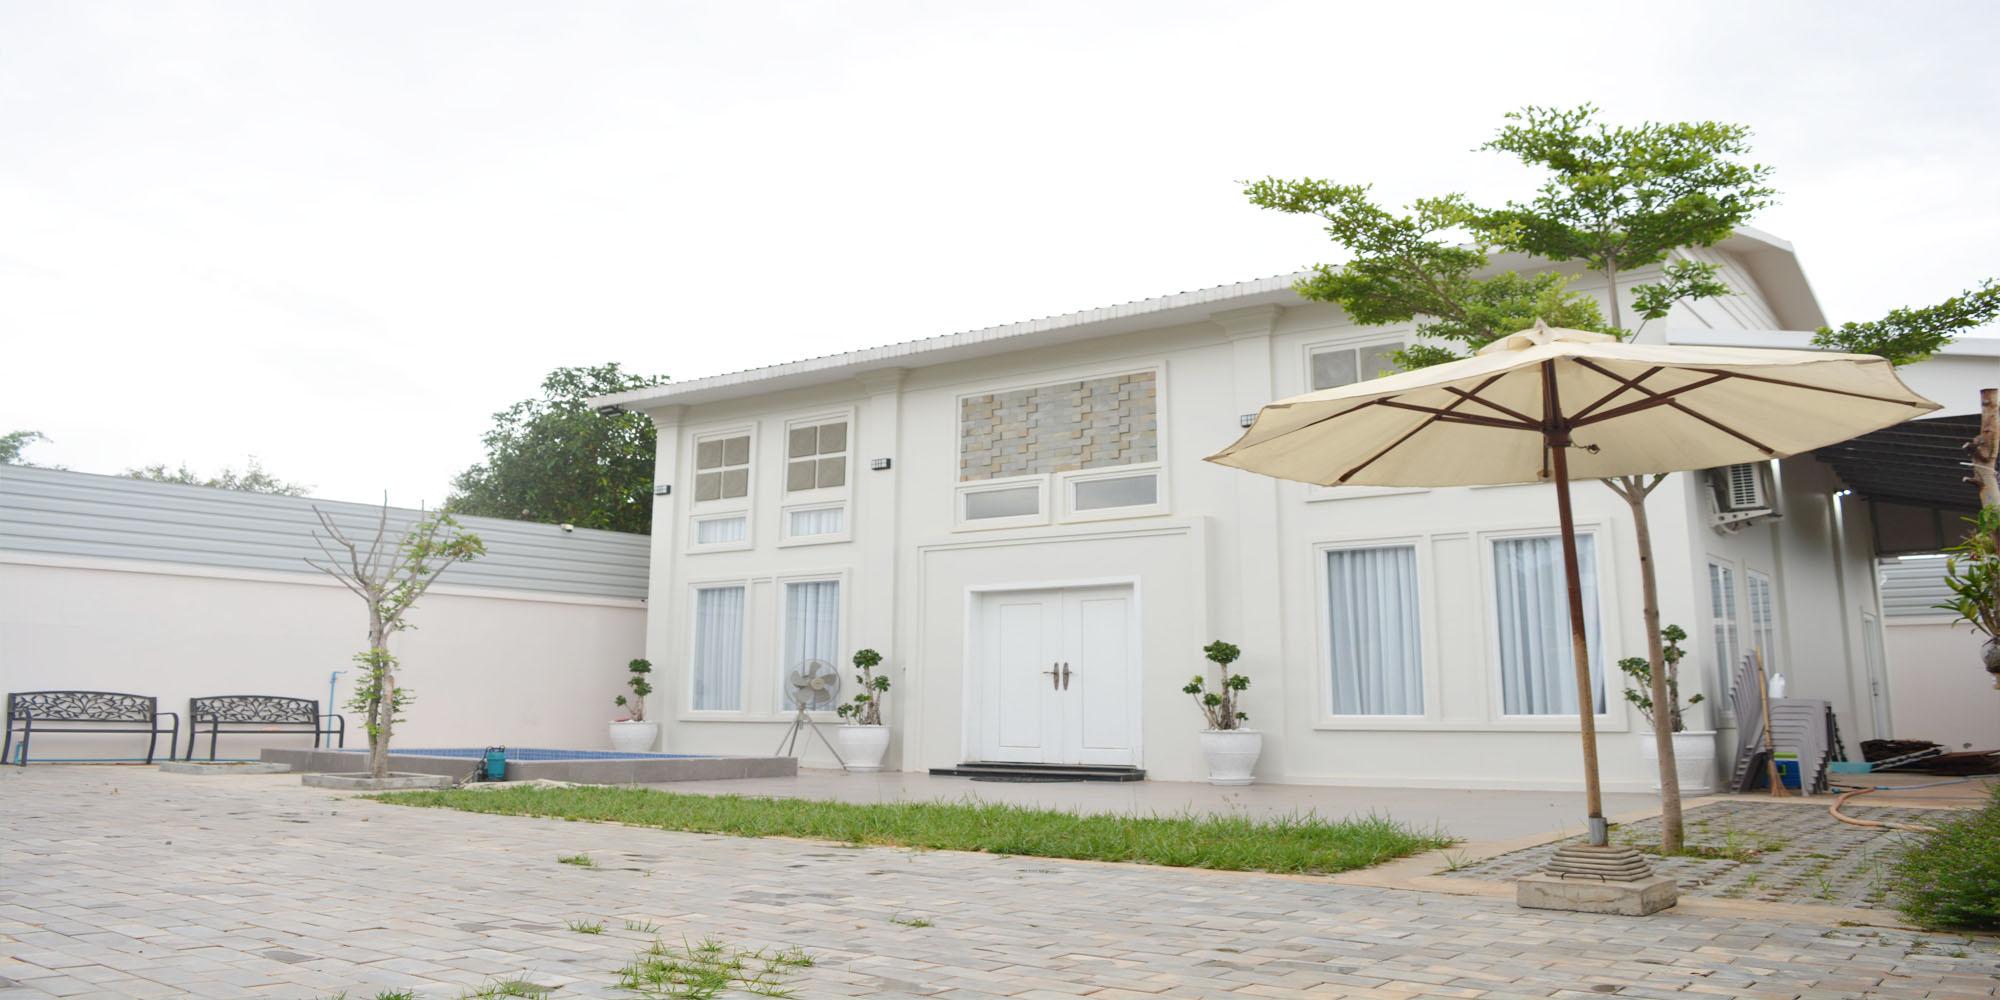 Luxury and Brand New 4 – Bedroom Villa for Rent in Siem Reap – Slor Kram [POOL]